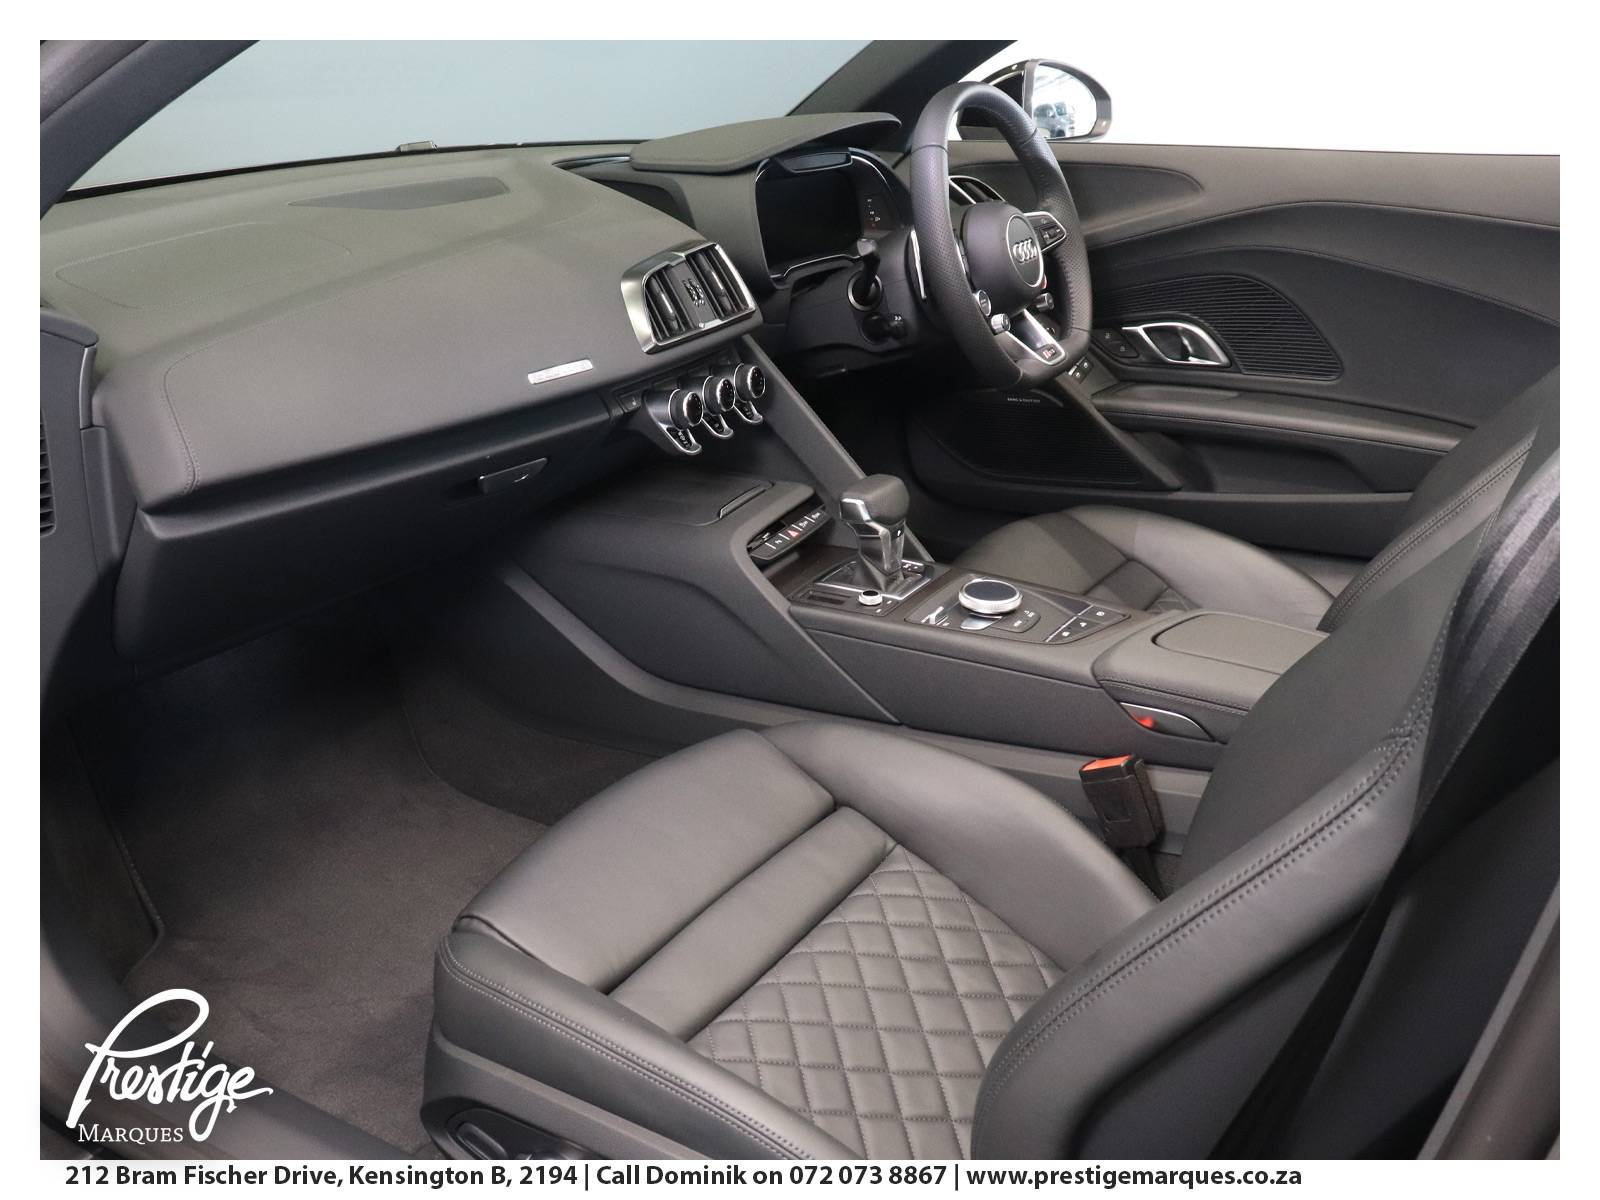 2019-Audi-R8-Prestige-Marques-Randburg-Sandton-18